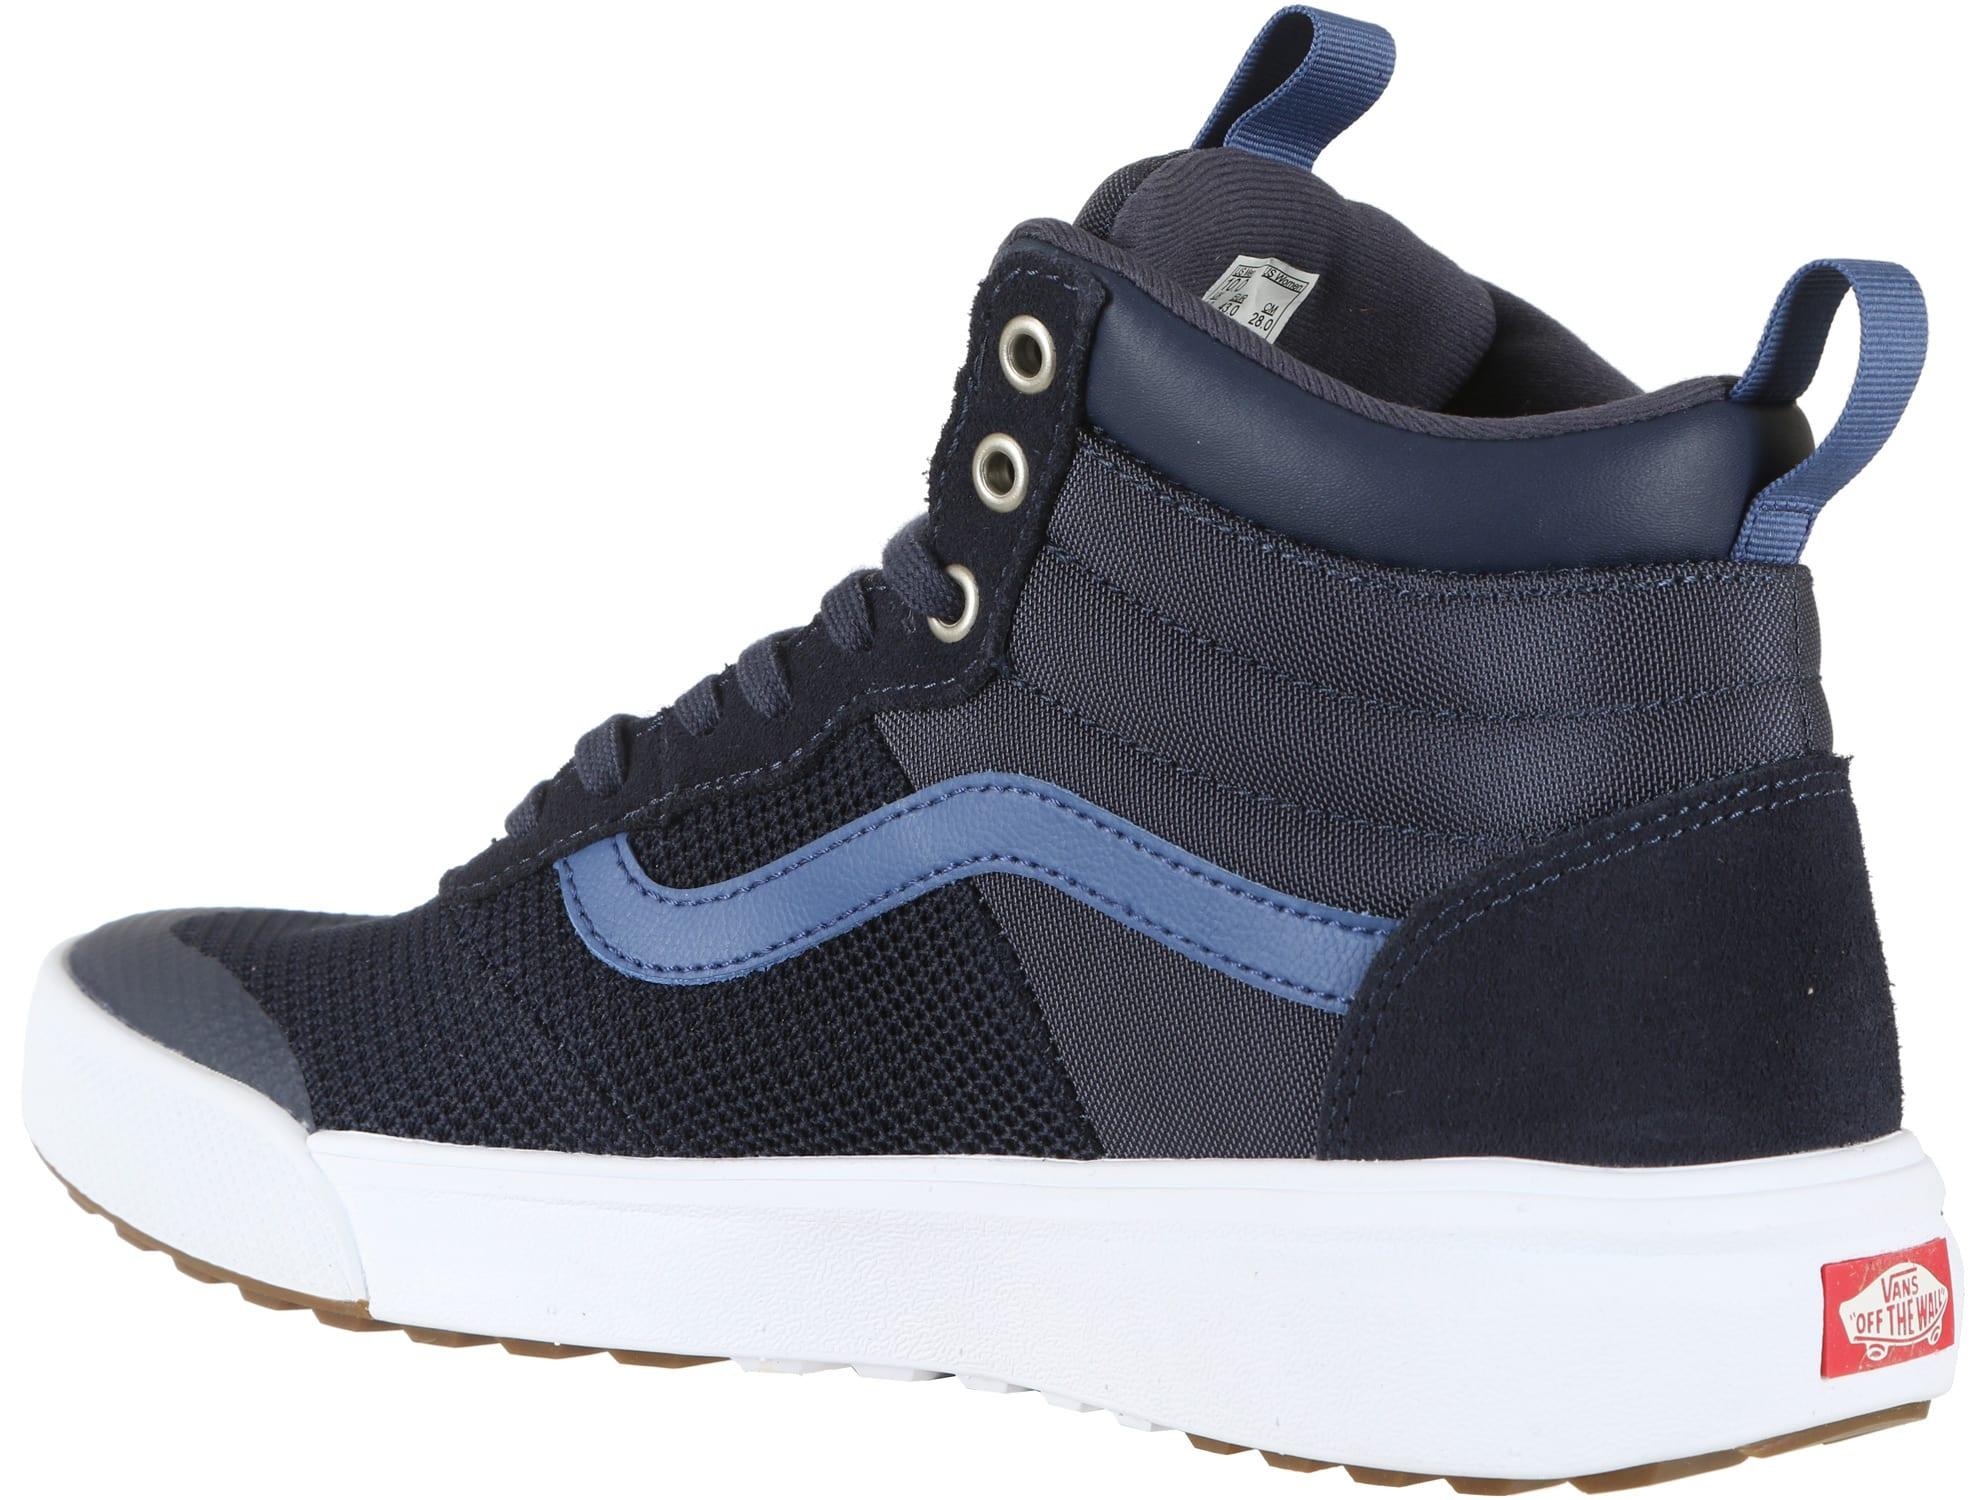 6bf49808f402d3 Vans Ultrarange Hi Skate Shoes - thumbnail 3